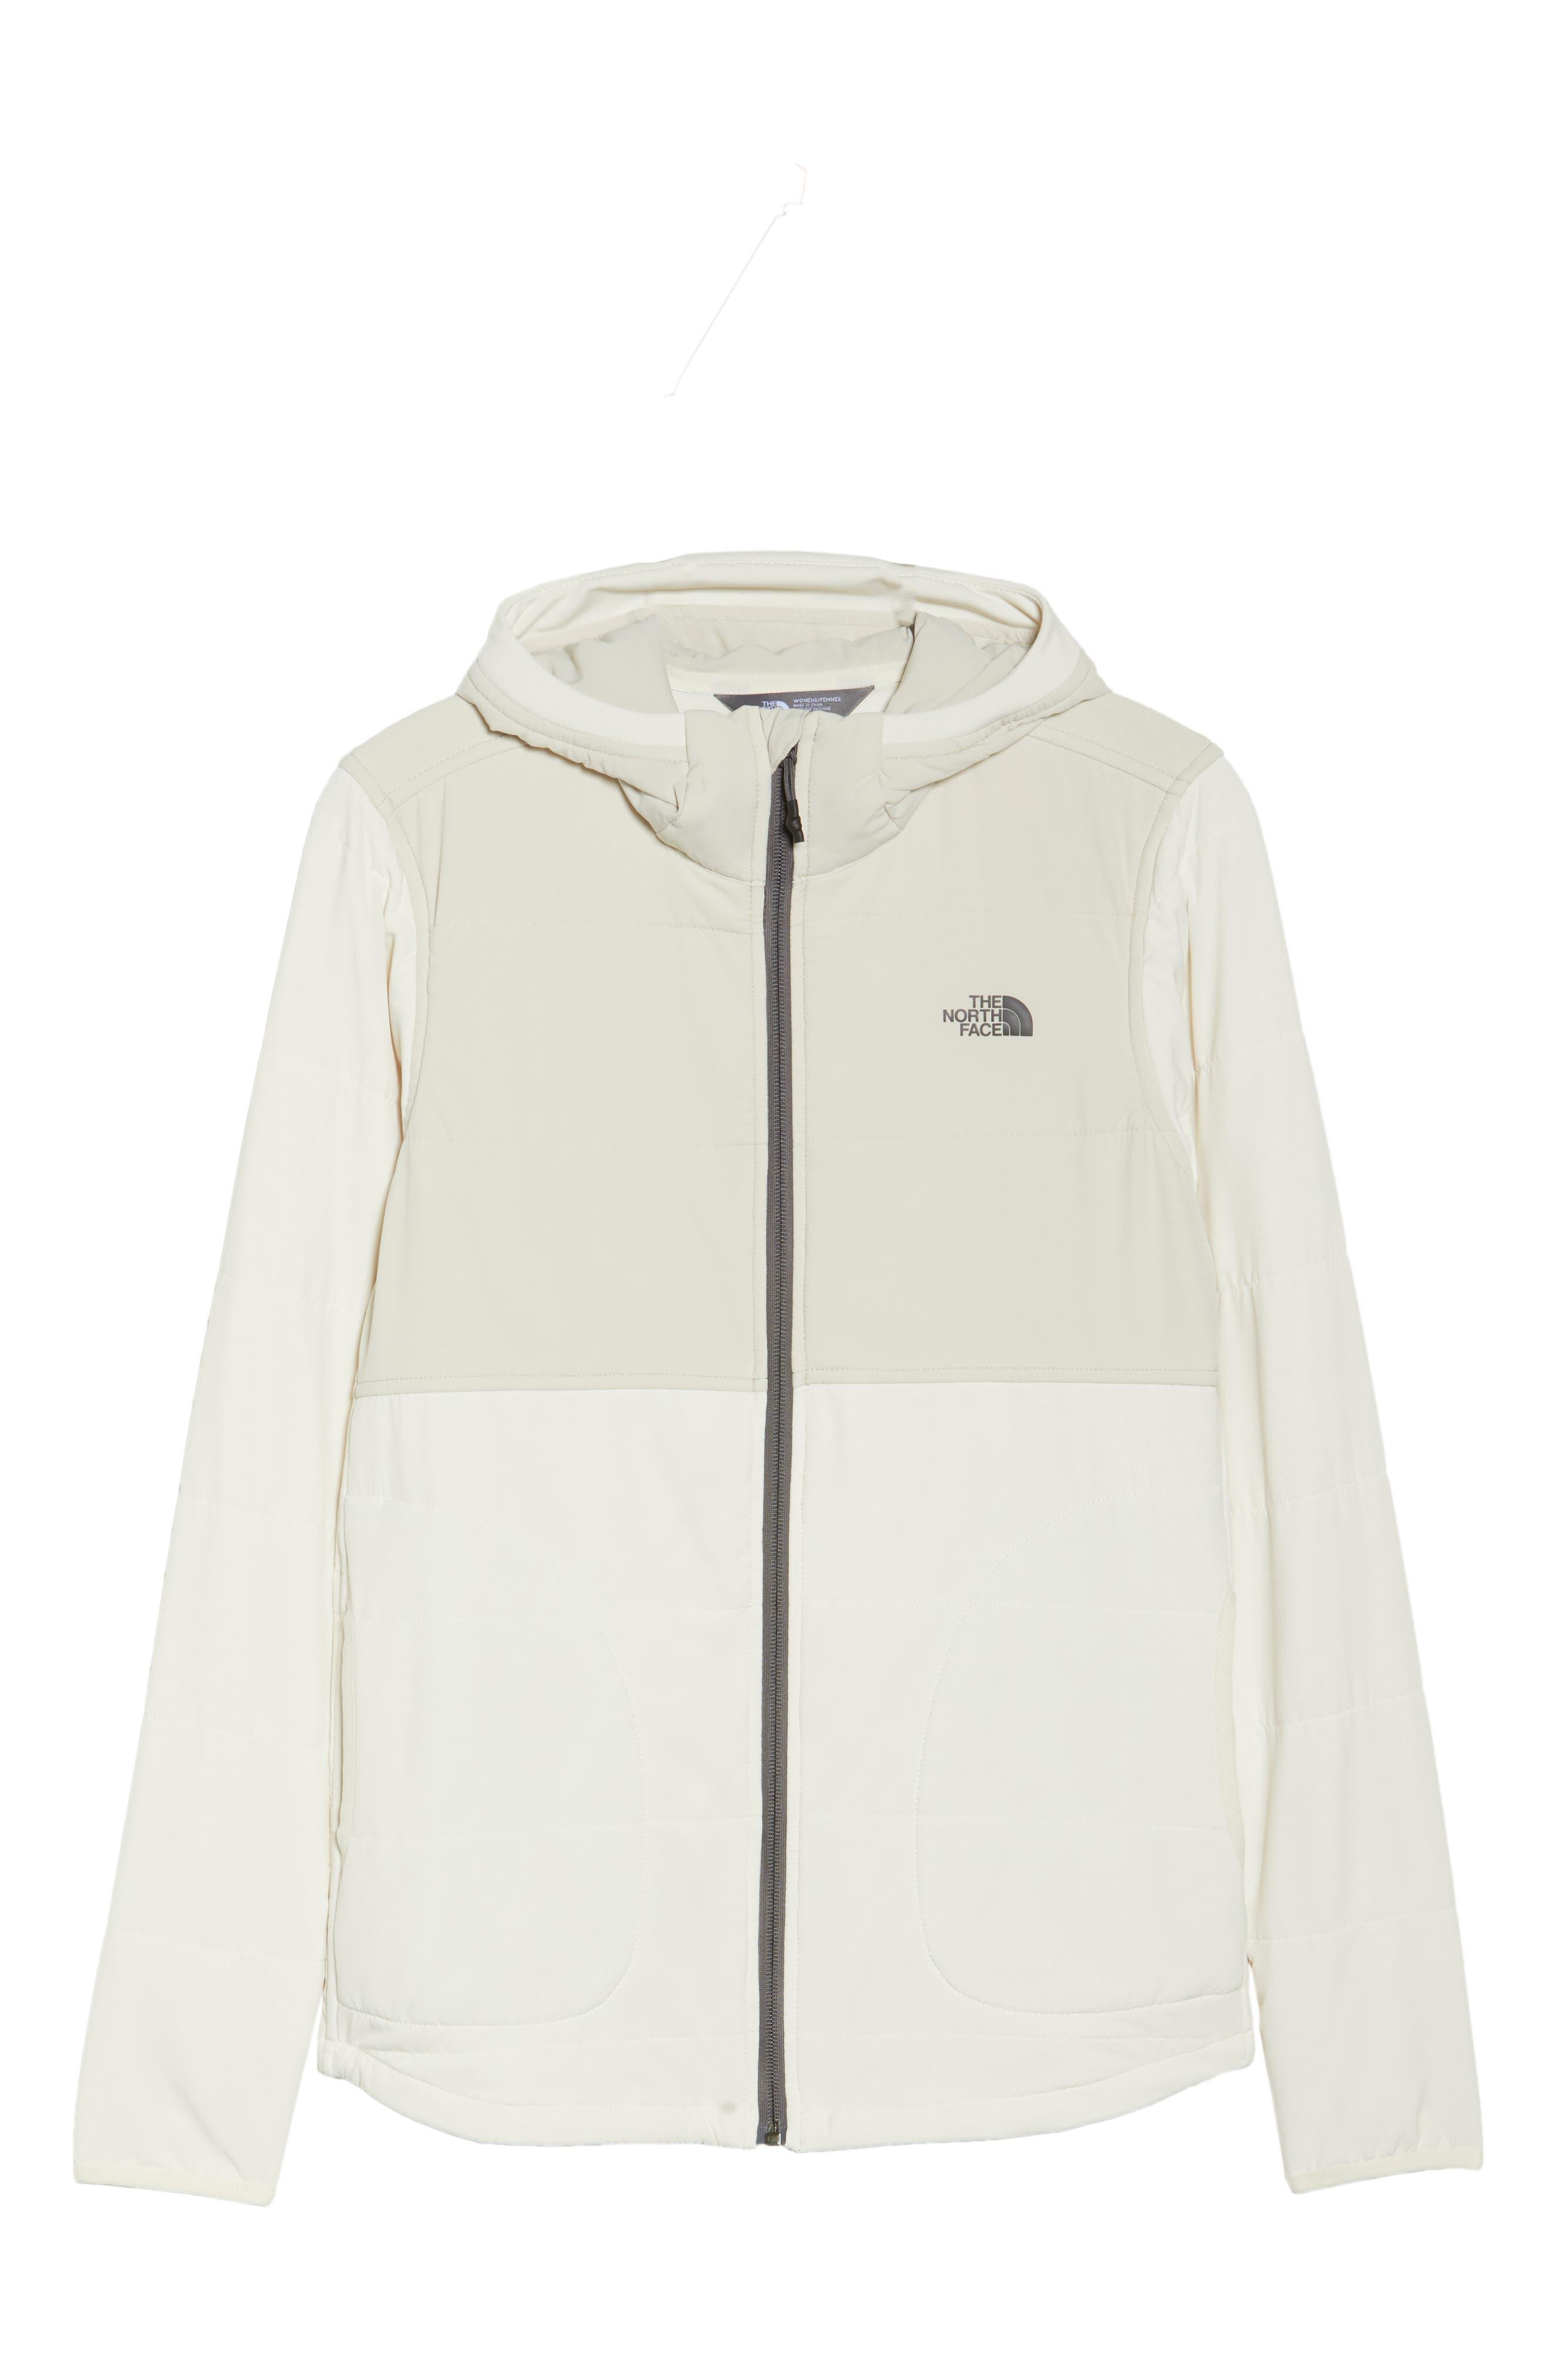 Mountain Sweatshirt Insulated Hooded Jacket,                             Alternate thumbnail 6, color,                             100